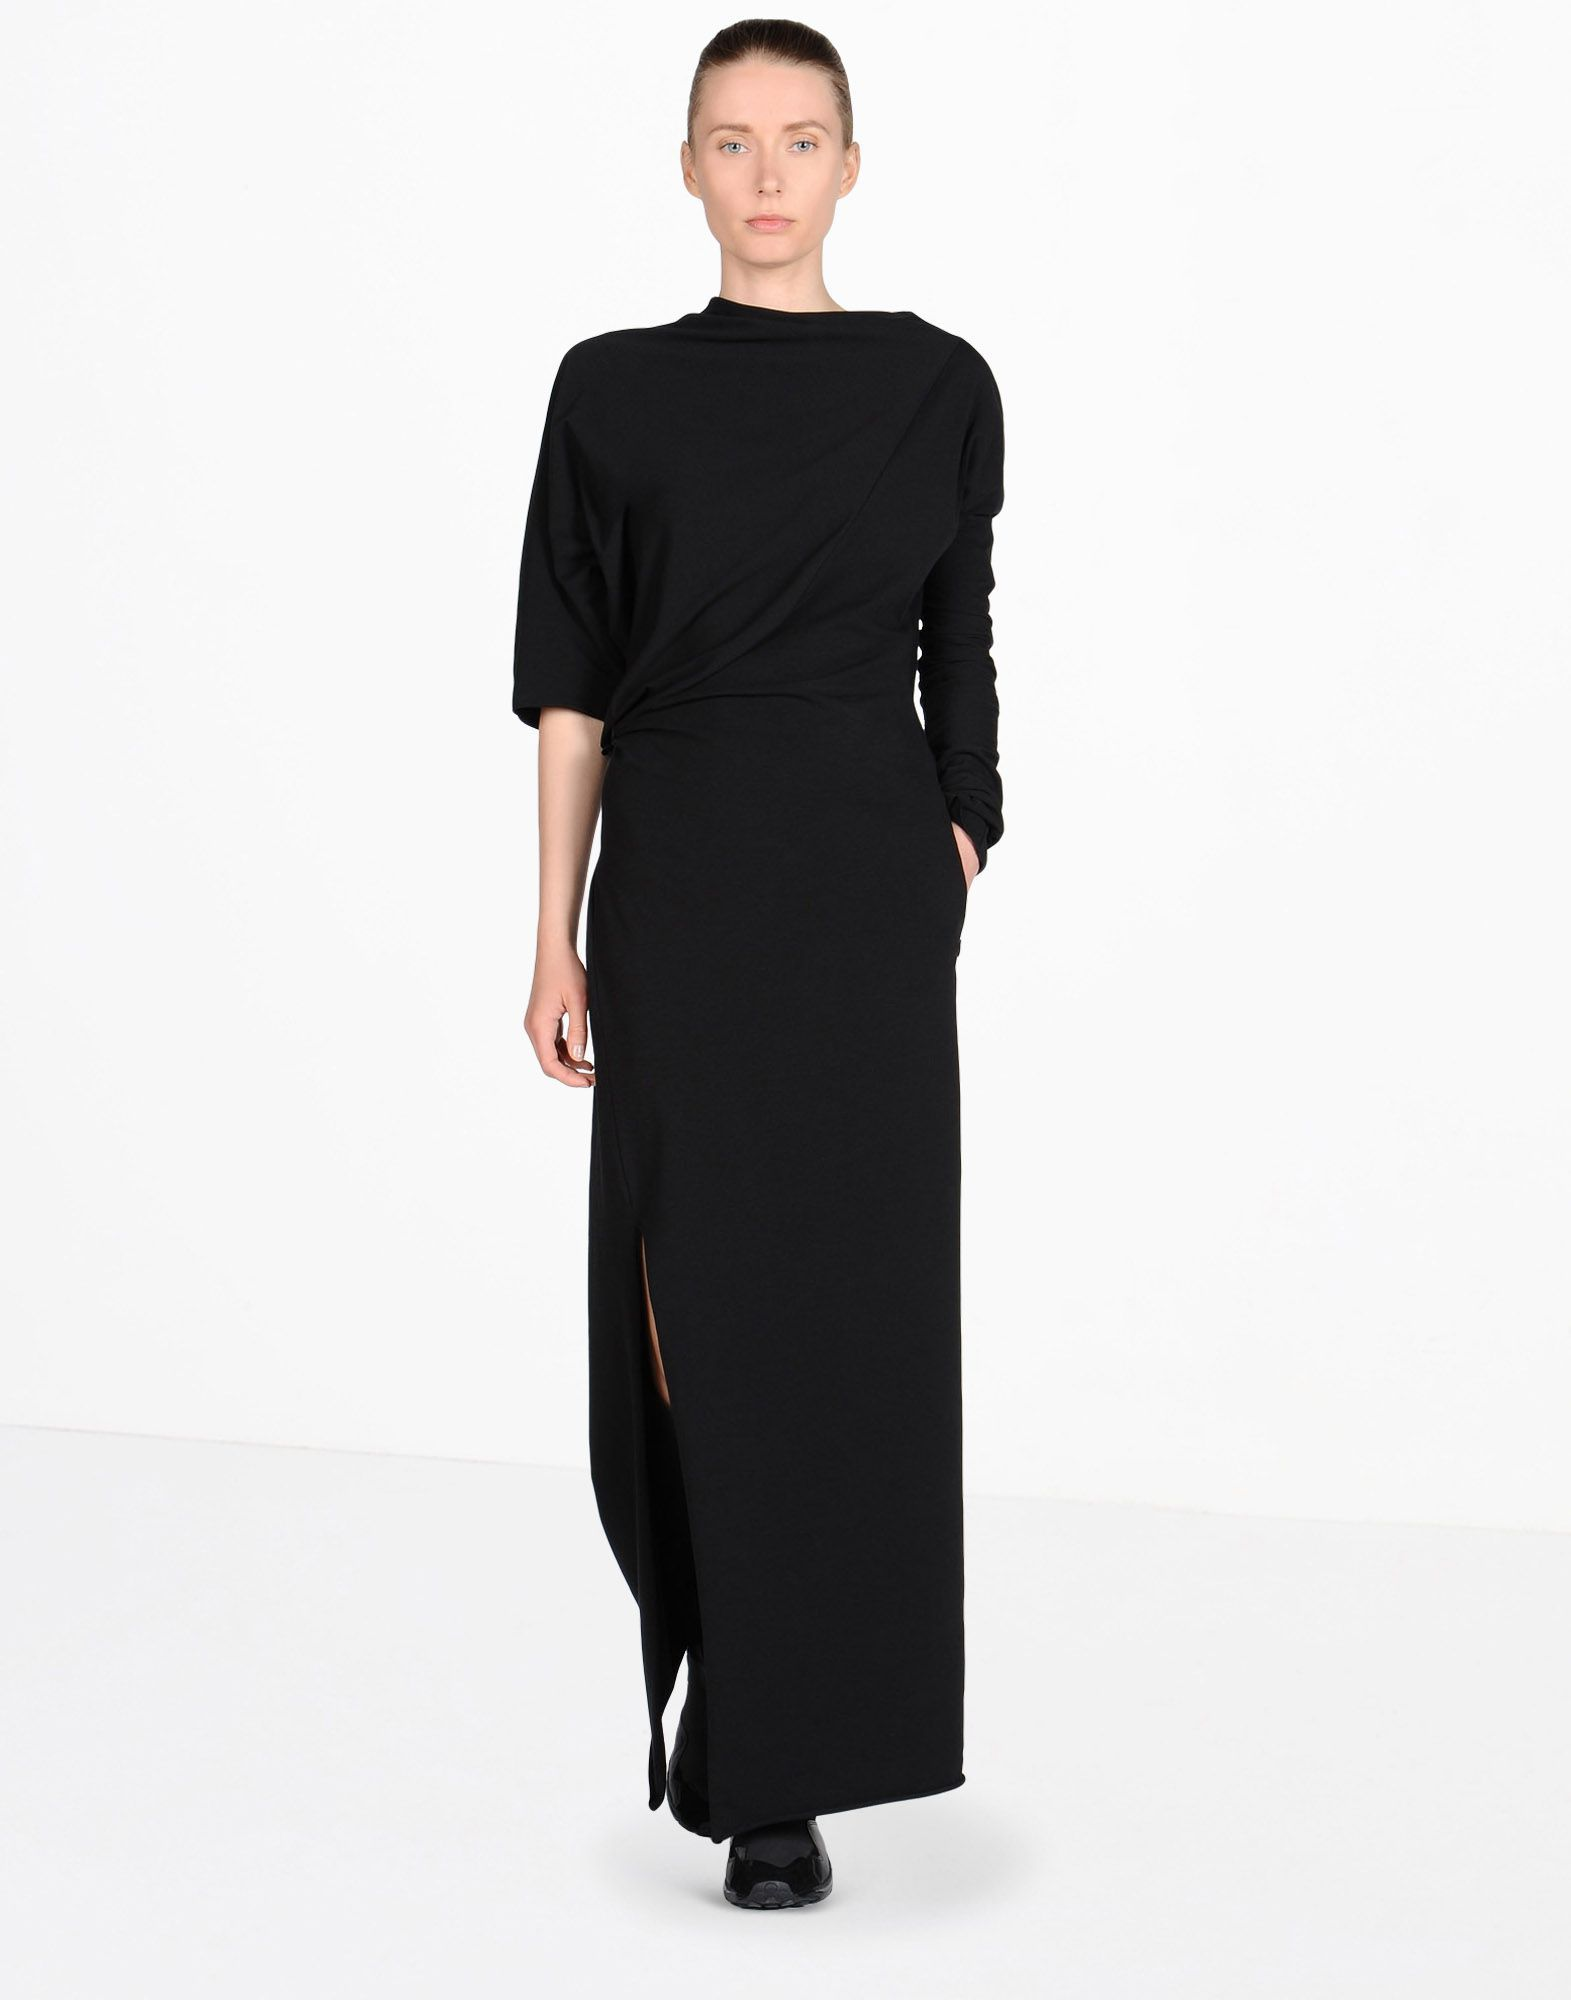 Dress Adidas 3 amp; Long Wanties Skirts Woman Dresses Versa Y wpBtnvqn